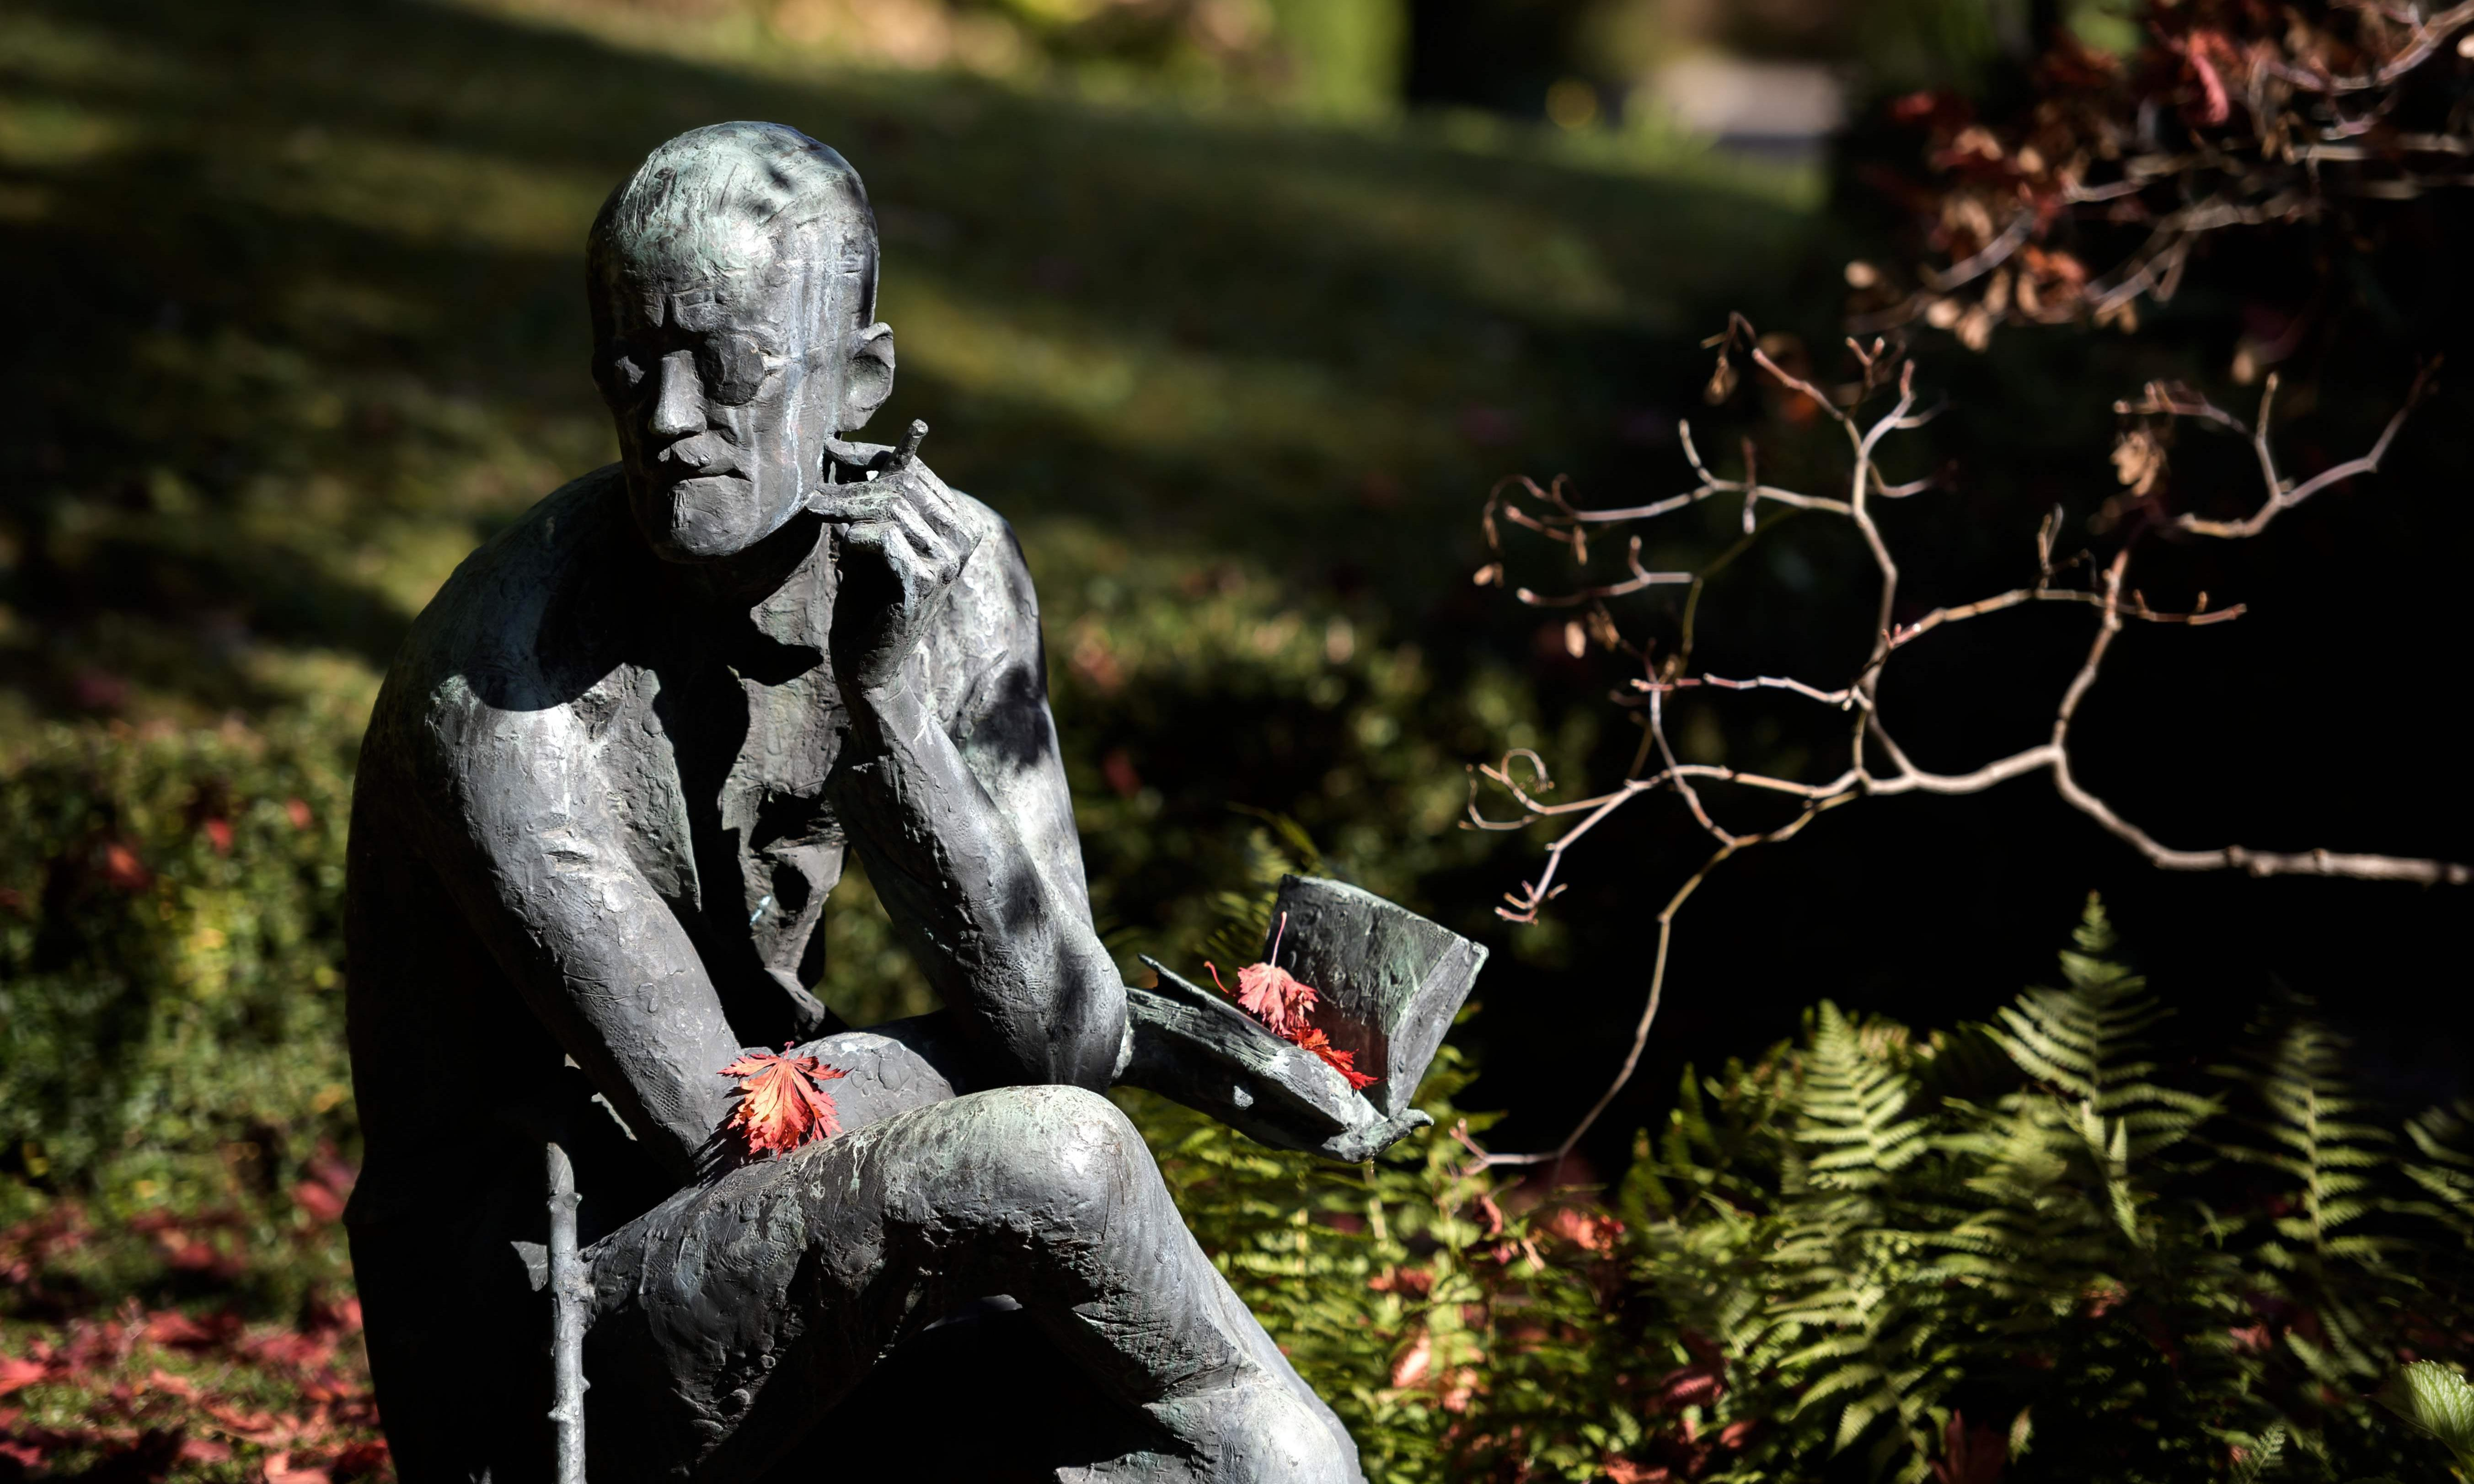 James Joyce's words haunt Dublin. It doesn't need his bones